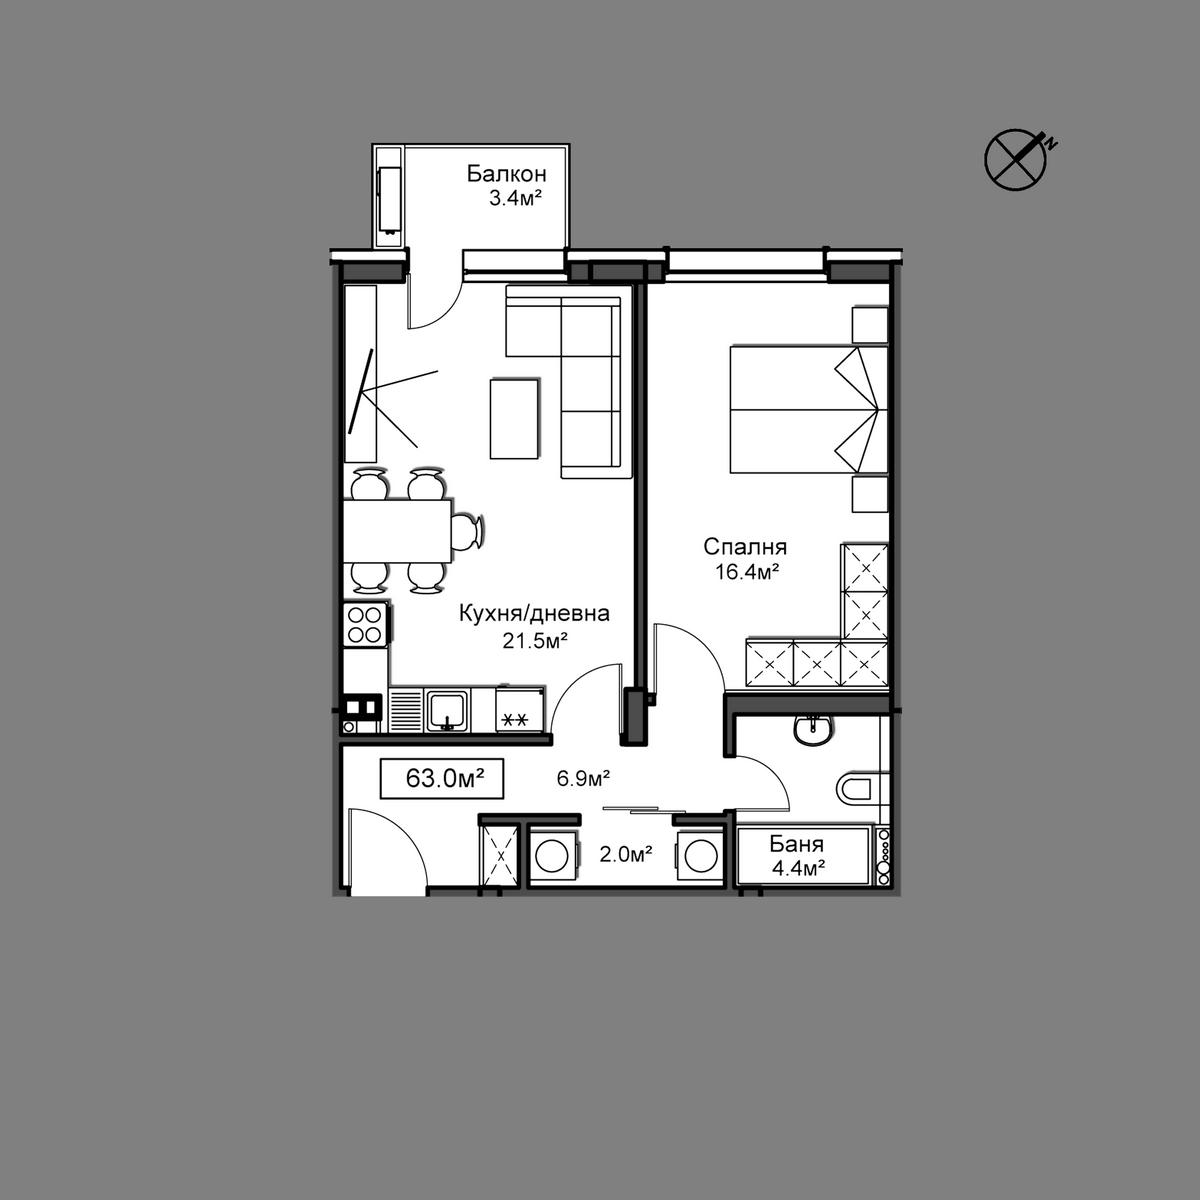 Продава апартамент - Апартамент 25